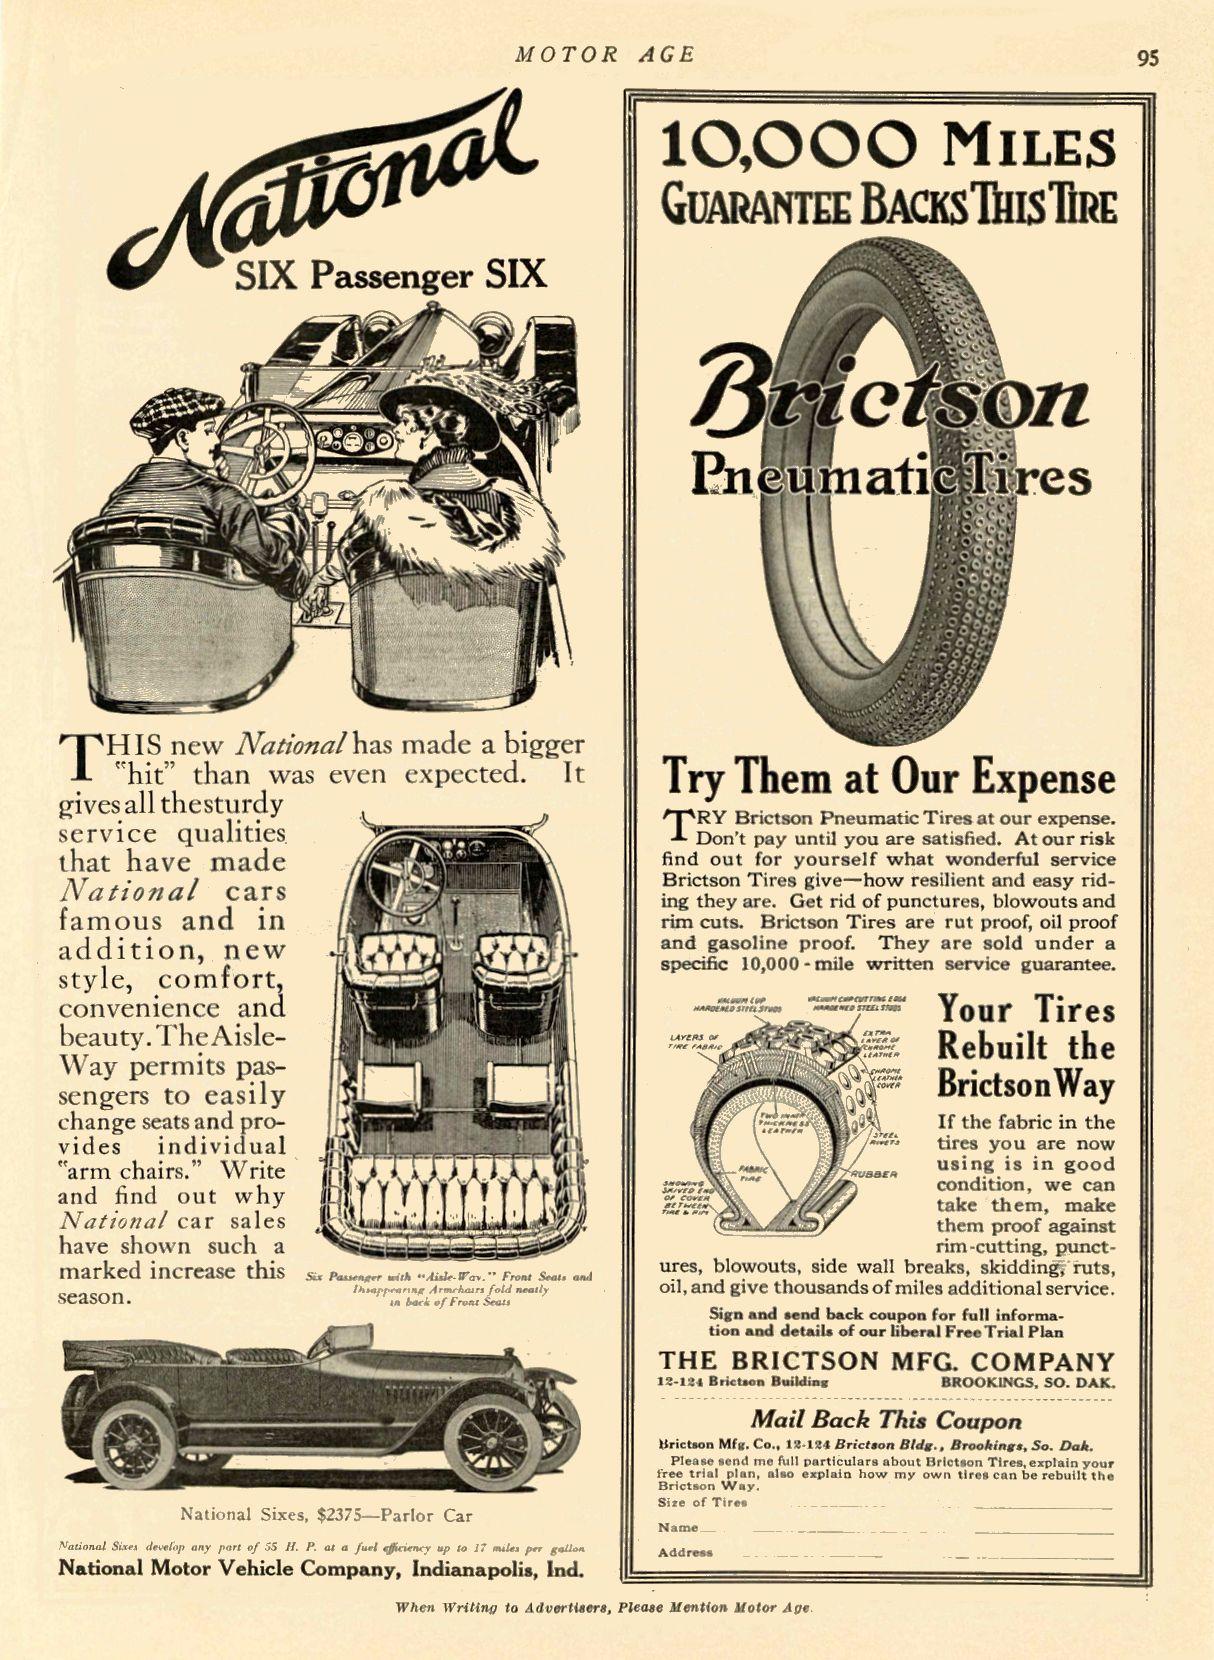 1914 NATIONAL National SIX Passenger SIX National Motor Vehicle Company Indianapolis, IND MOTOR AGE 1914 8.25″x11.75″ page 95